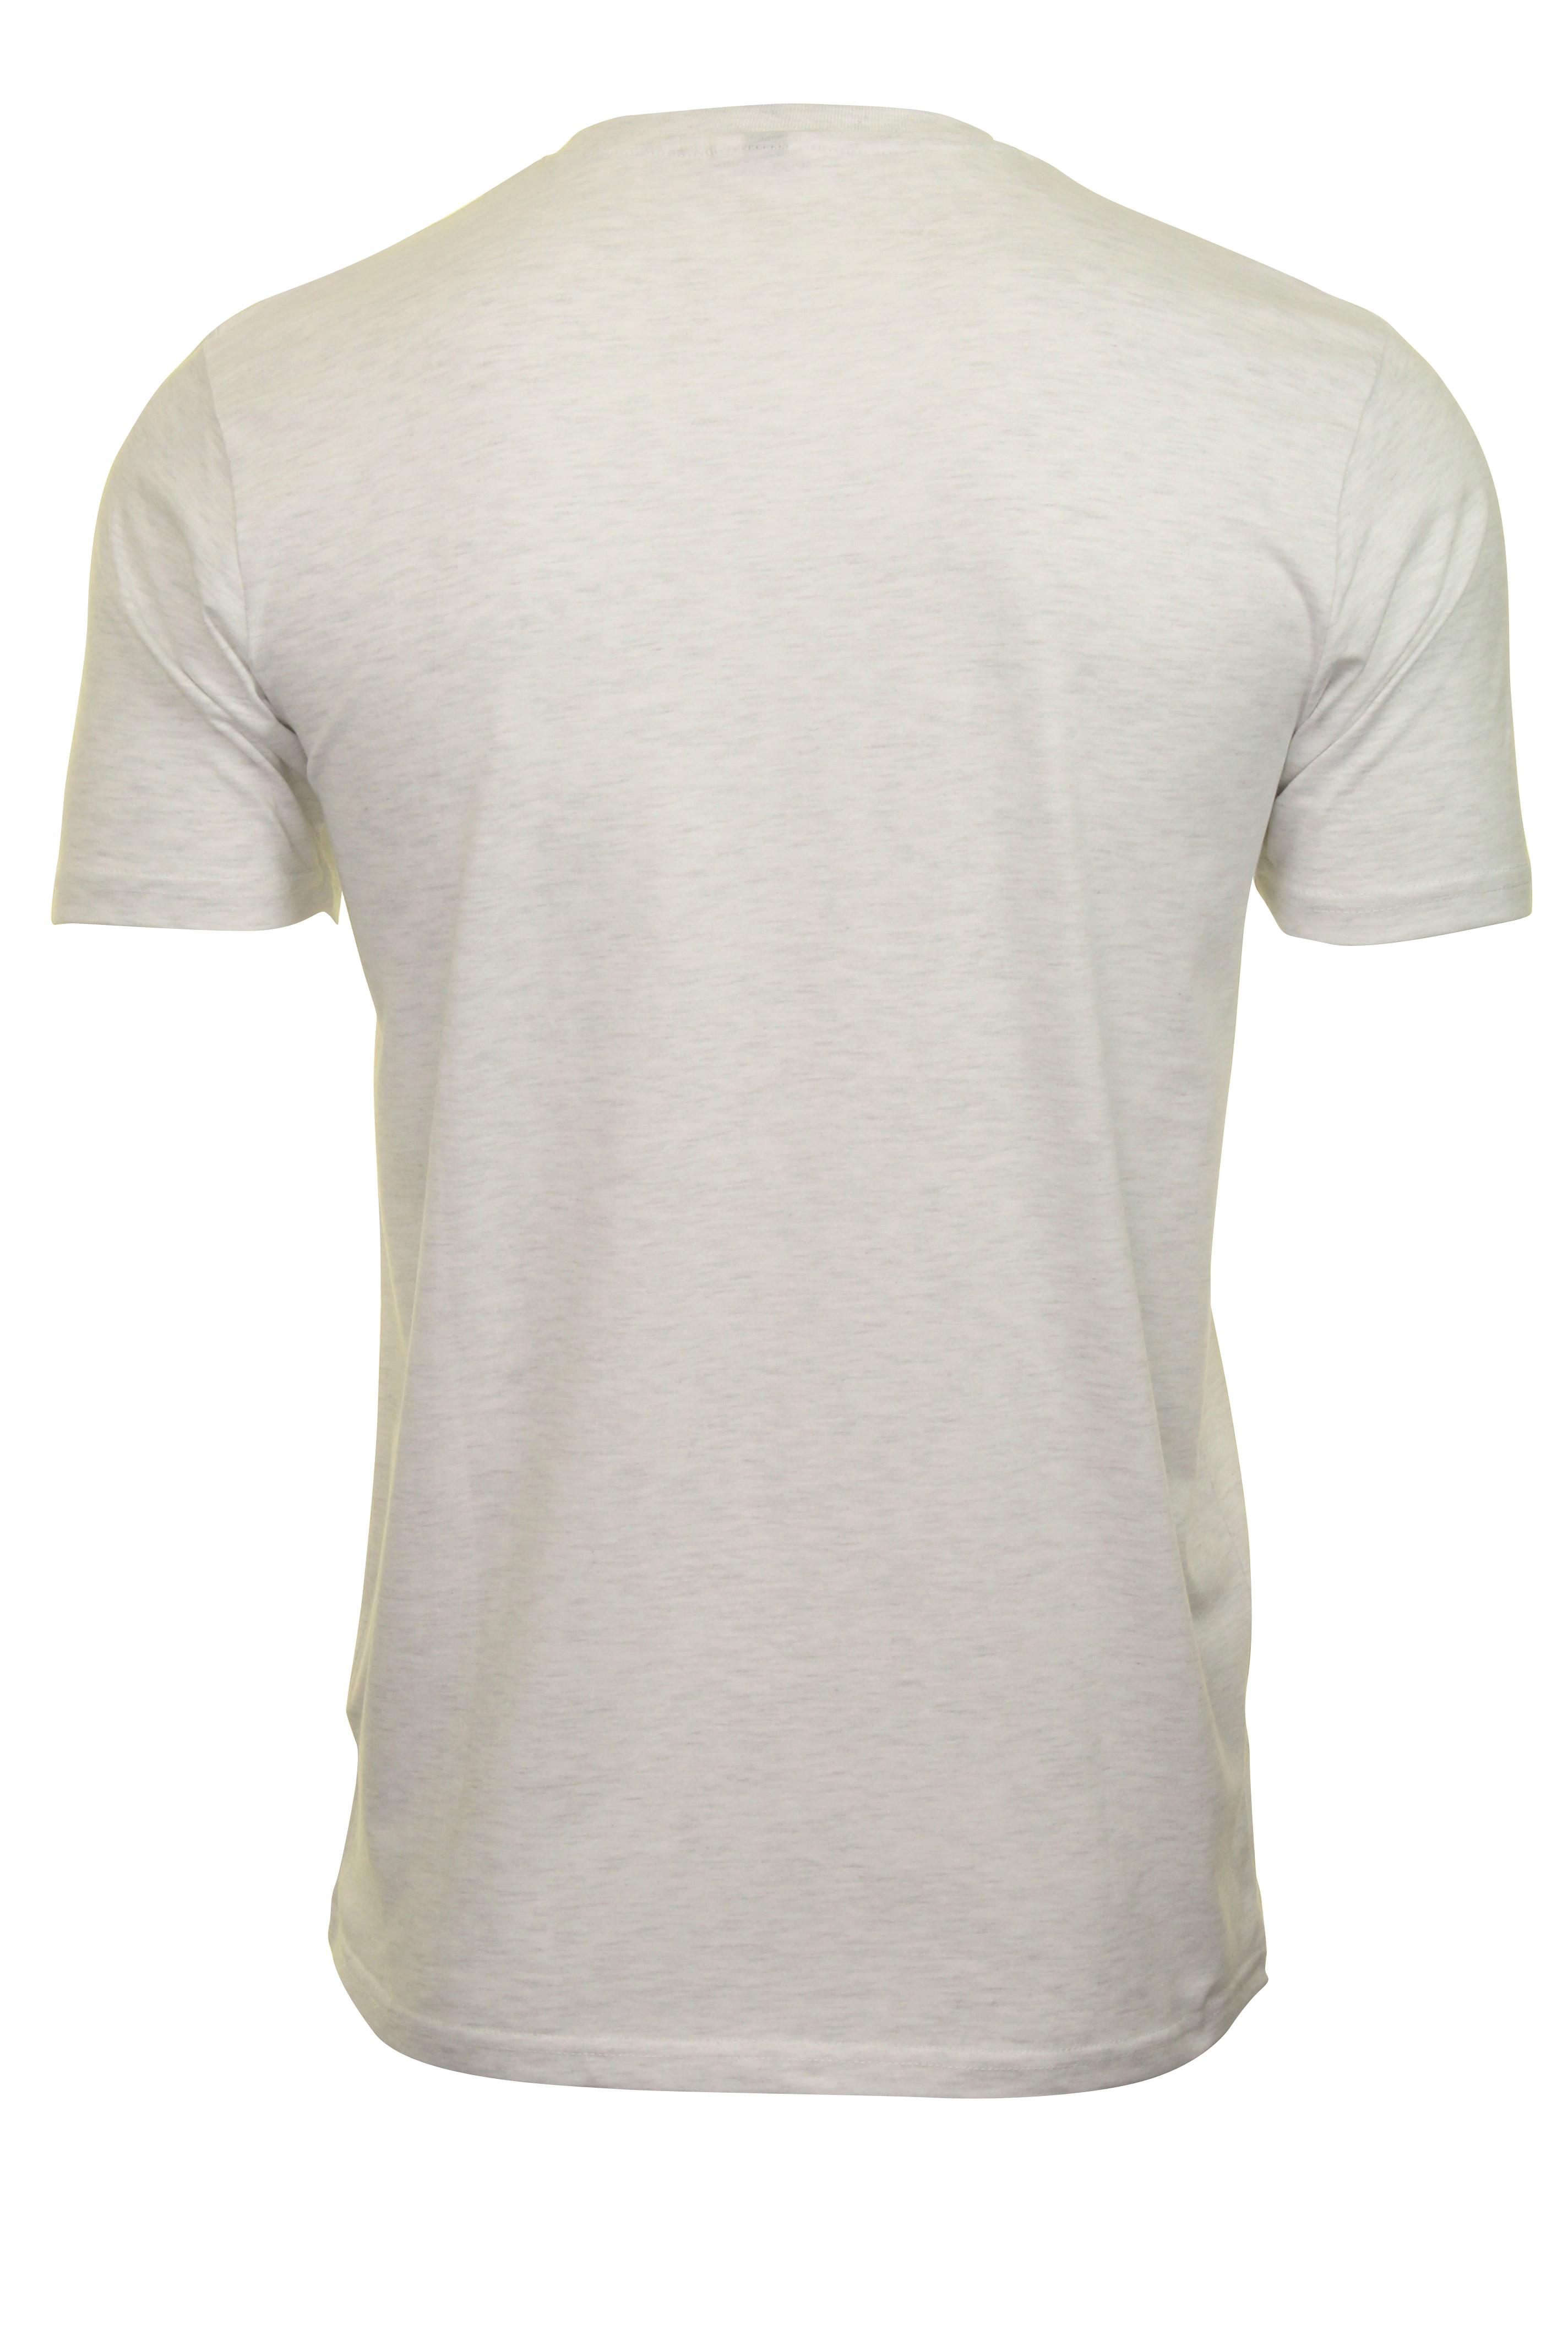 Mens-Ellesse-T-Shirt-039-Prado-039-Short-Sleeved thumbnail 23